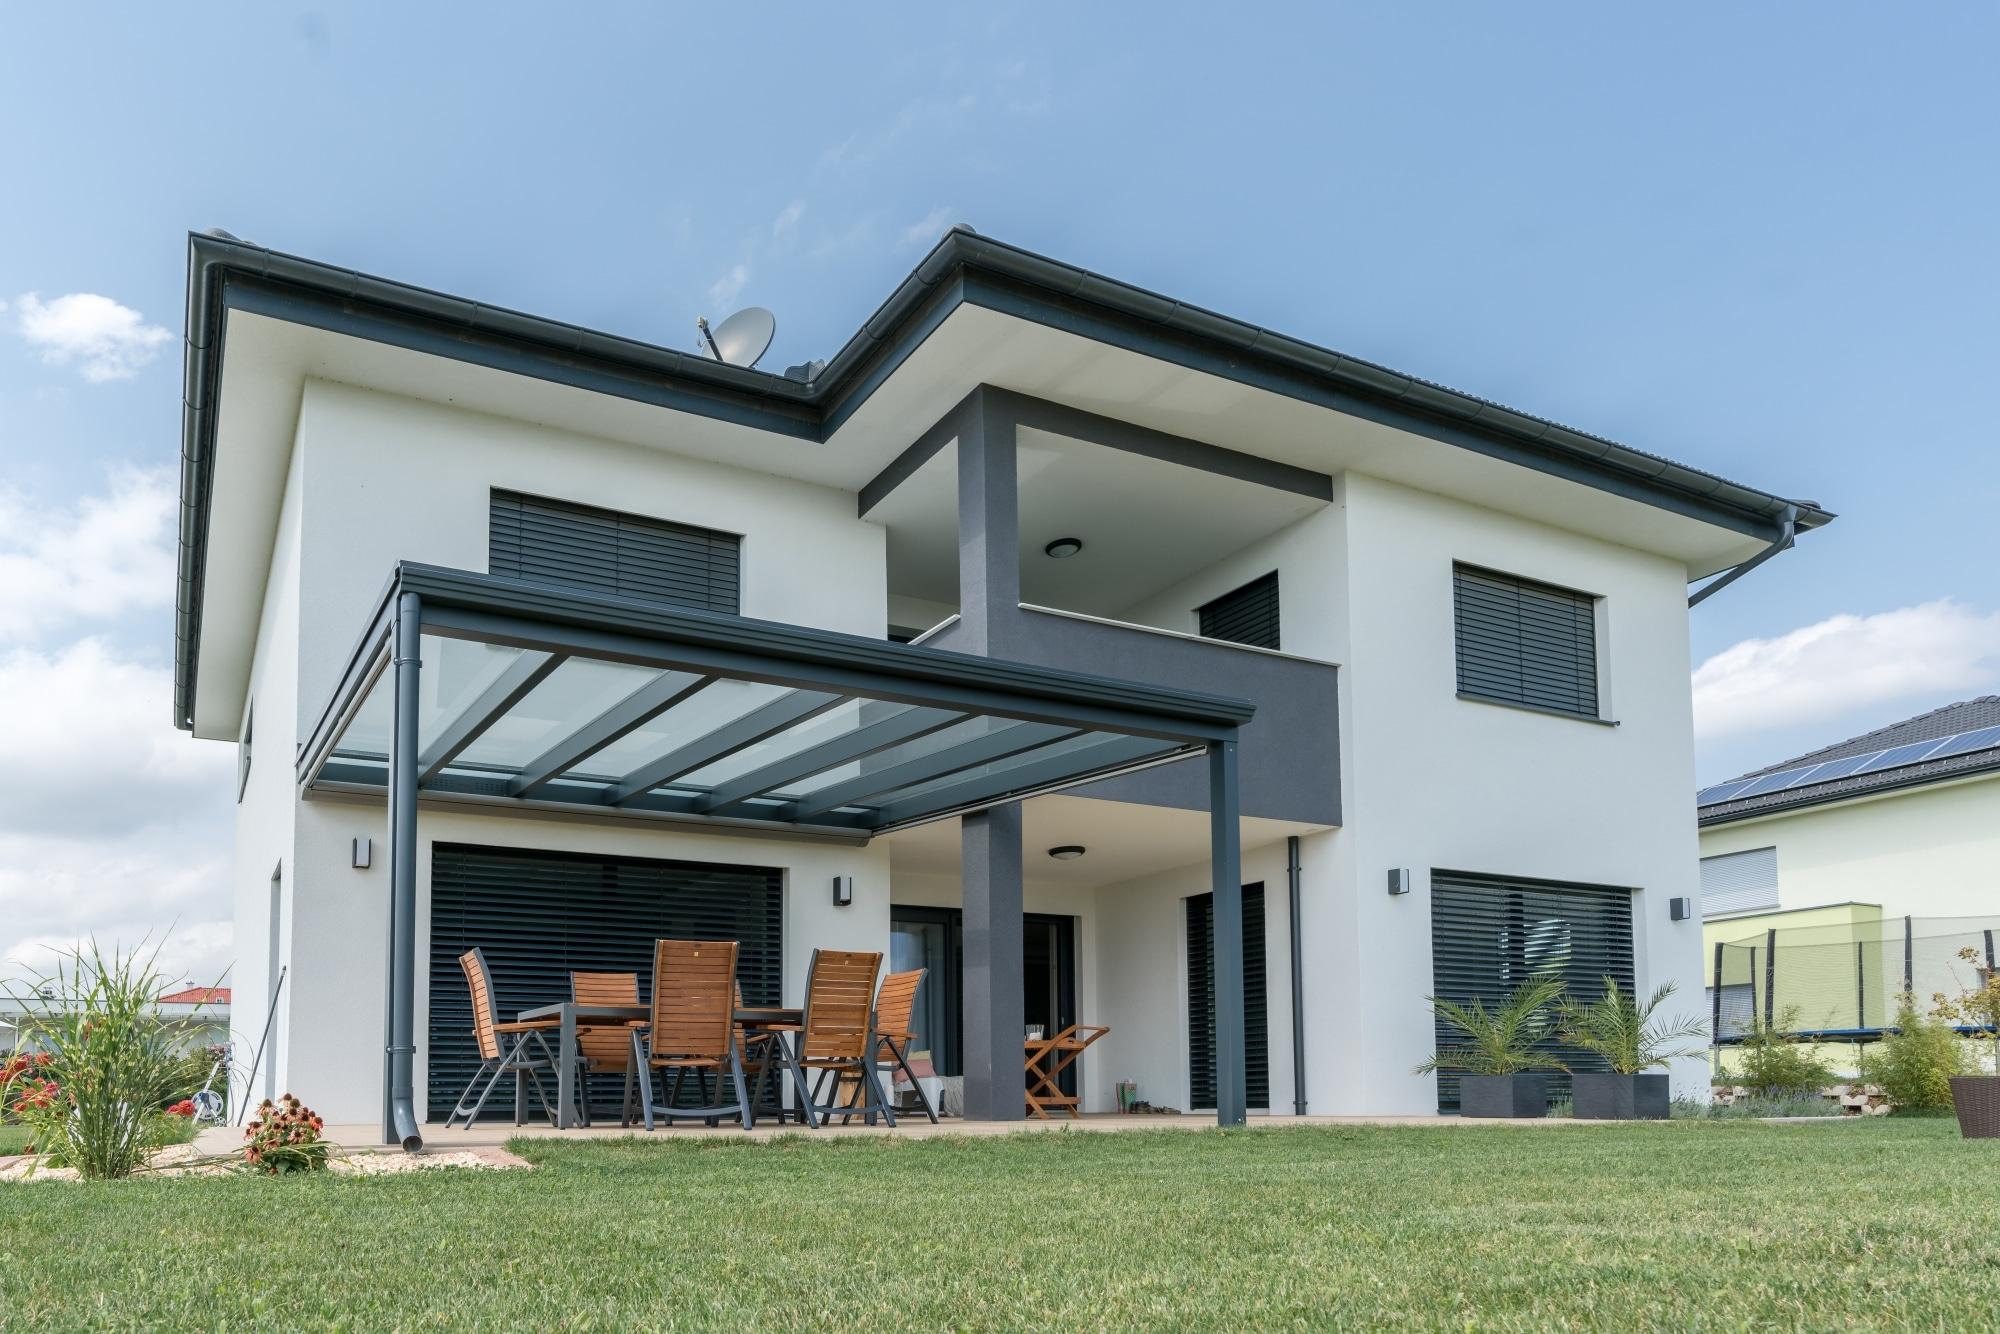 Überdachungen & Vordächer aus Aluminium & Edelstahl   Svoboda Metall